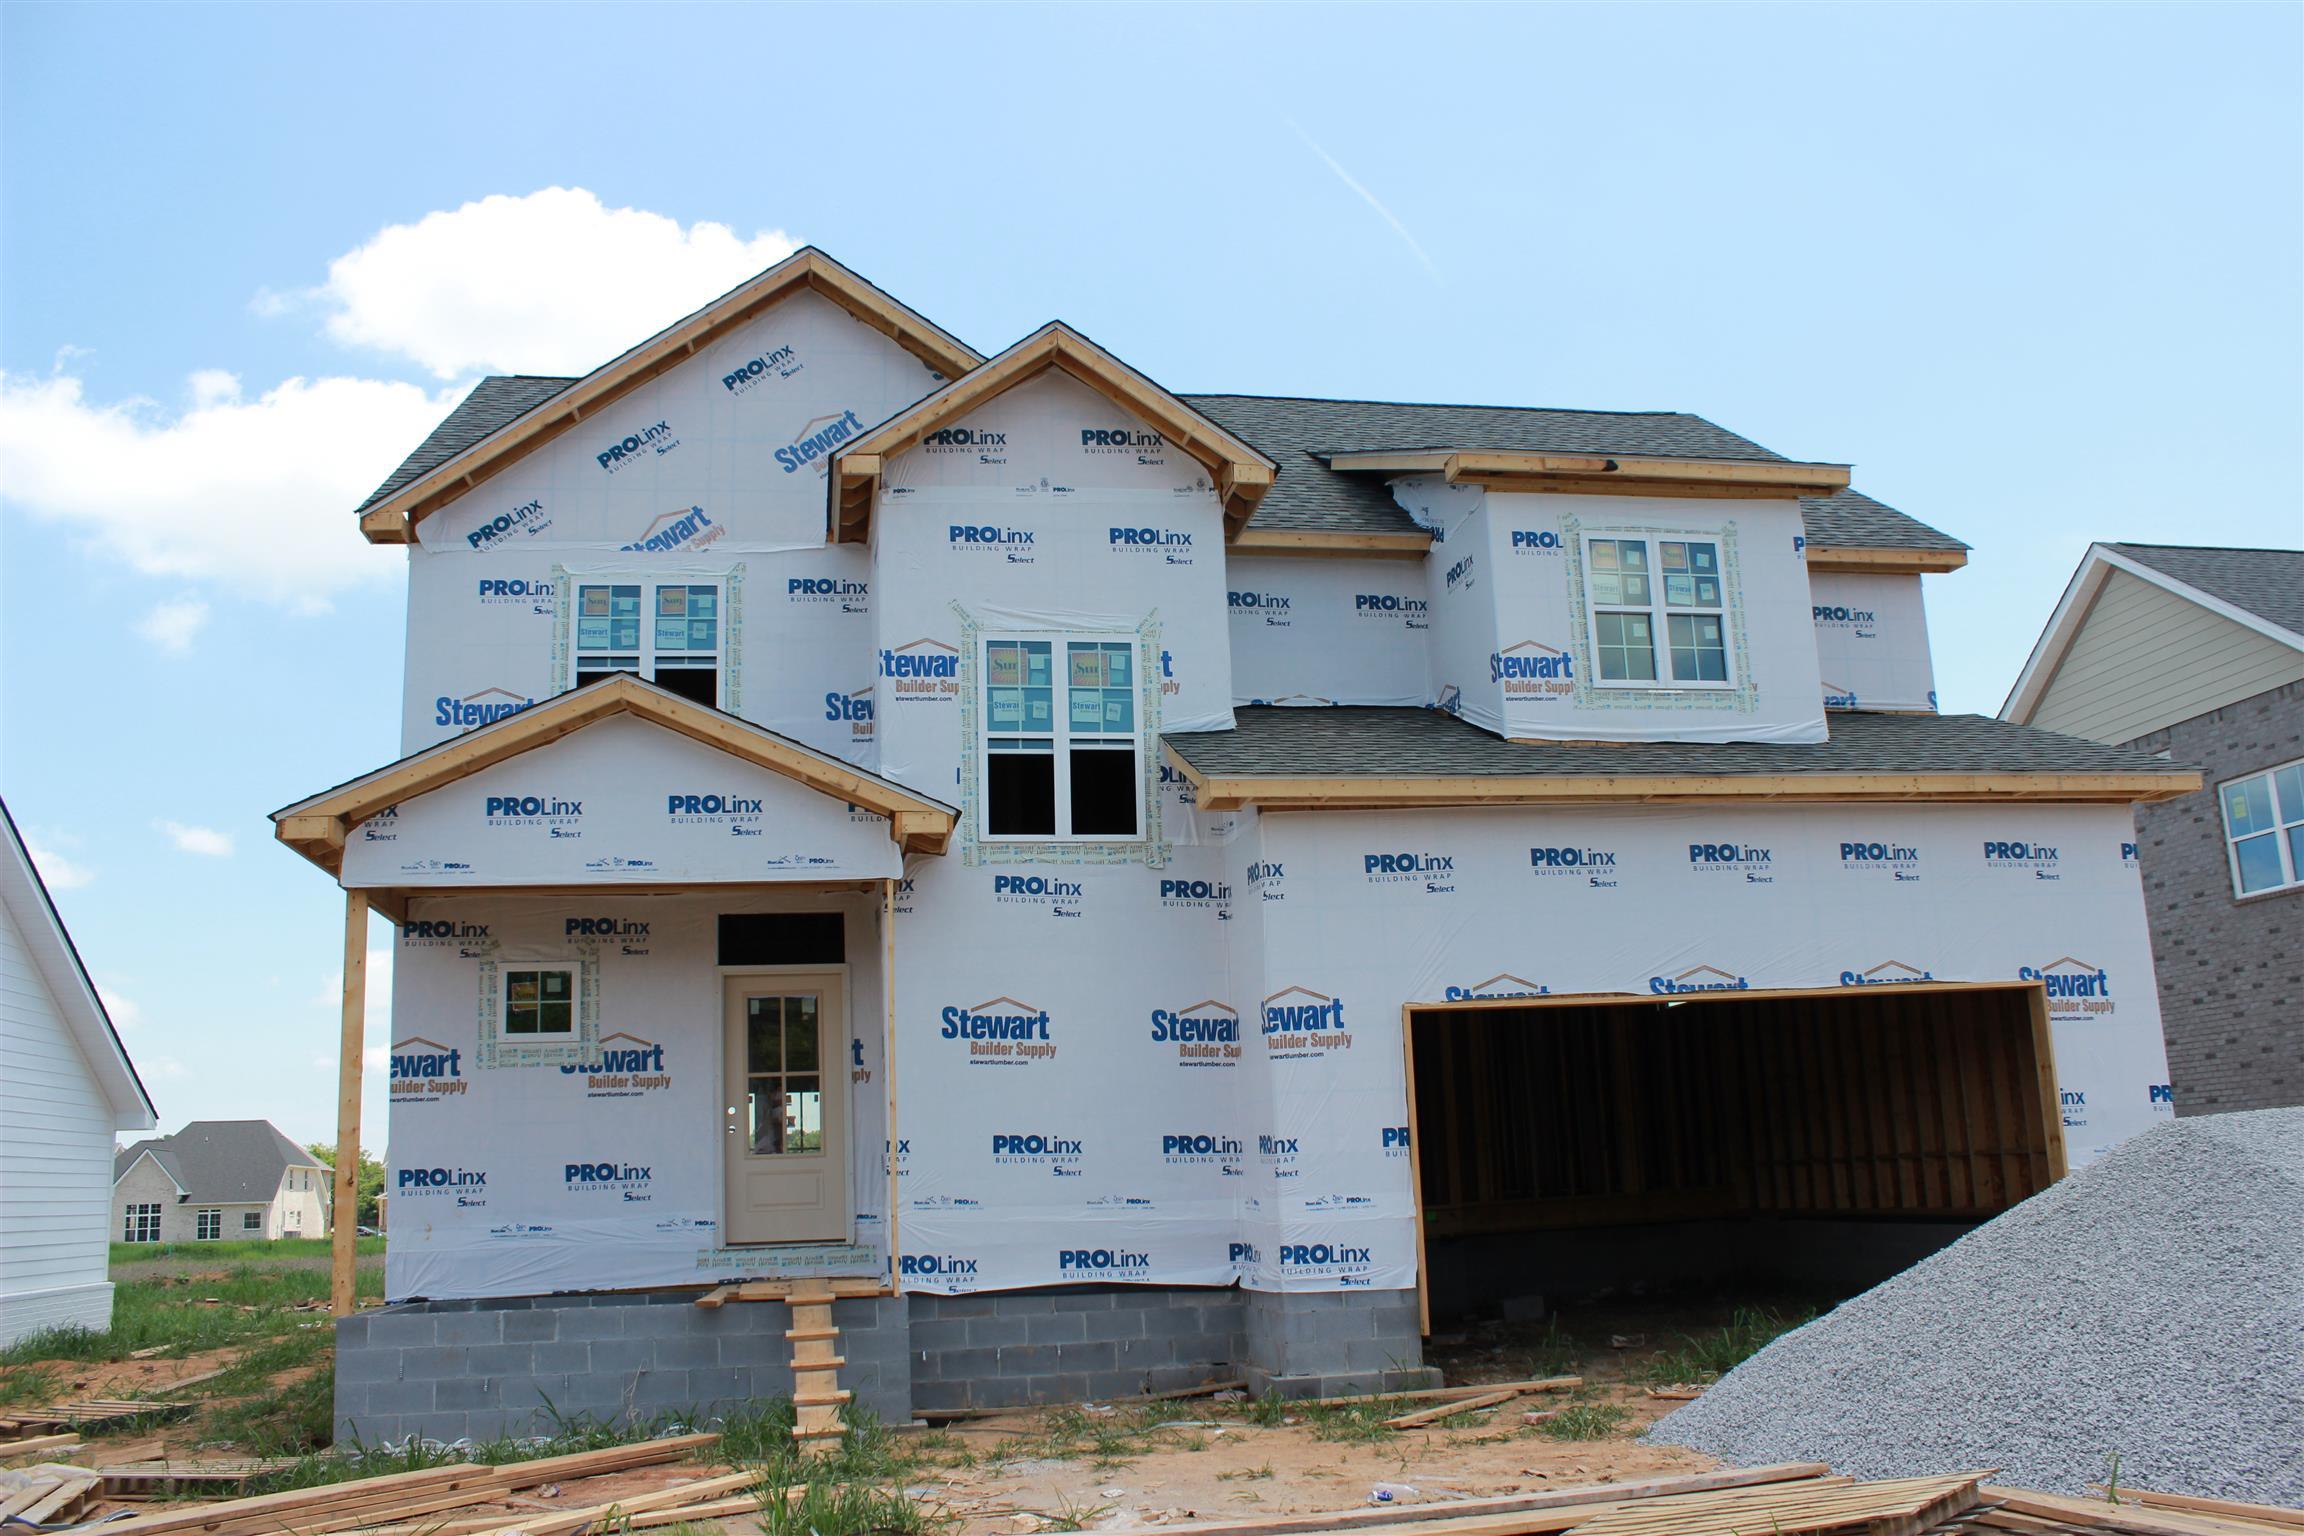 533 Dexter Drive Lot 91, Clarksville, TN 37043 - Clarksville, TN real estate listing